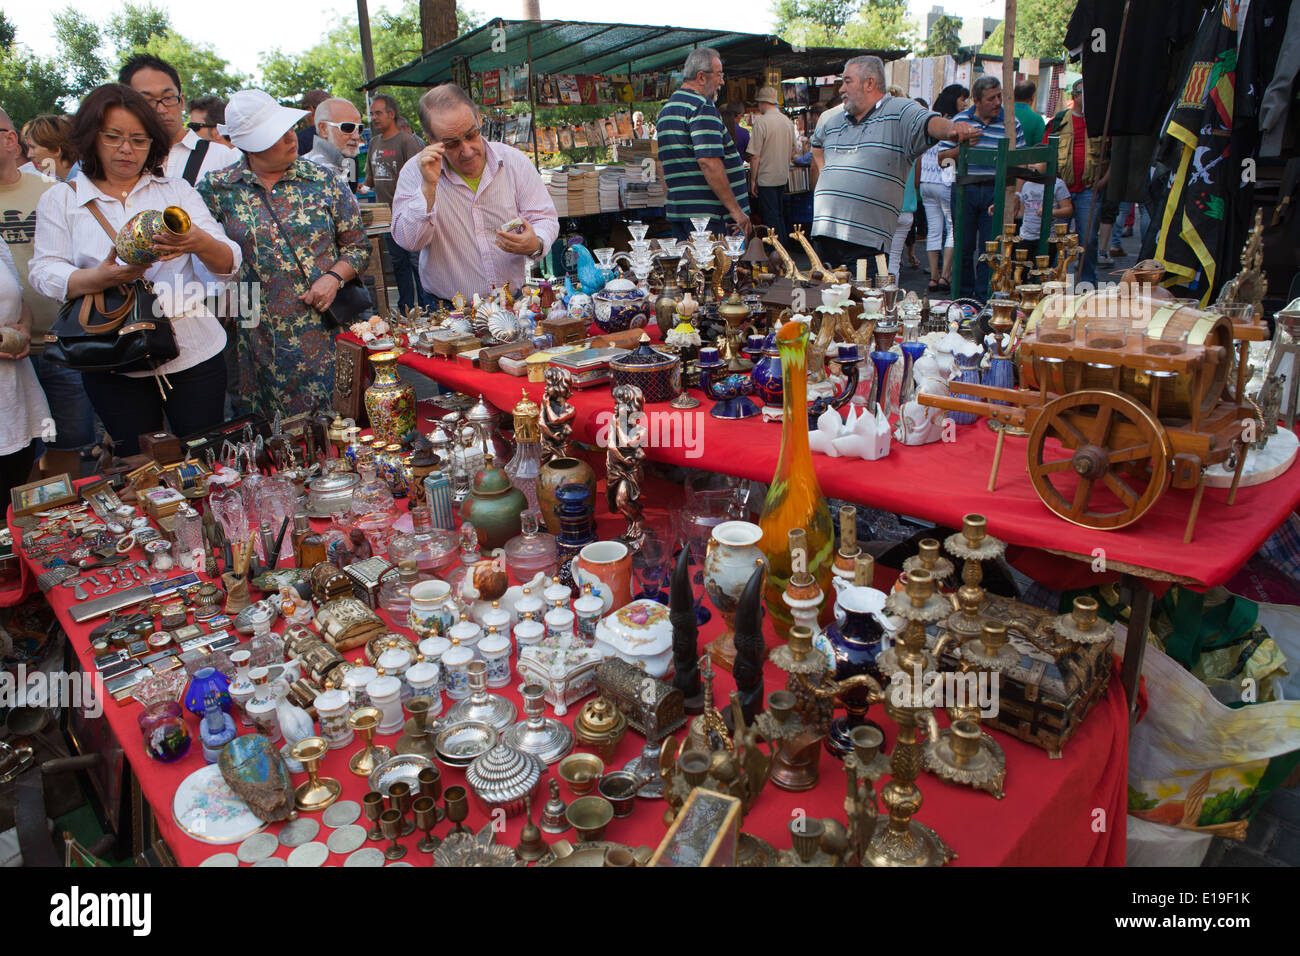 Bargain hunters at the El Rastro Flea Market in Madrid Stock Photo